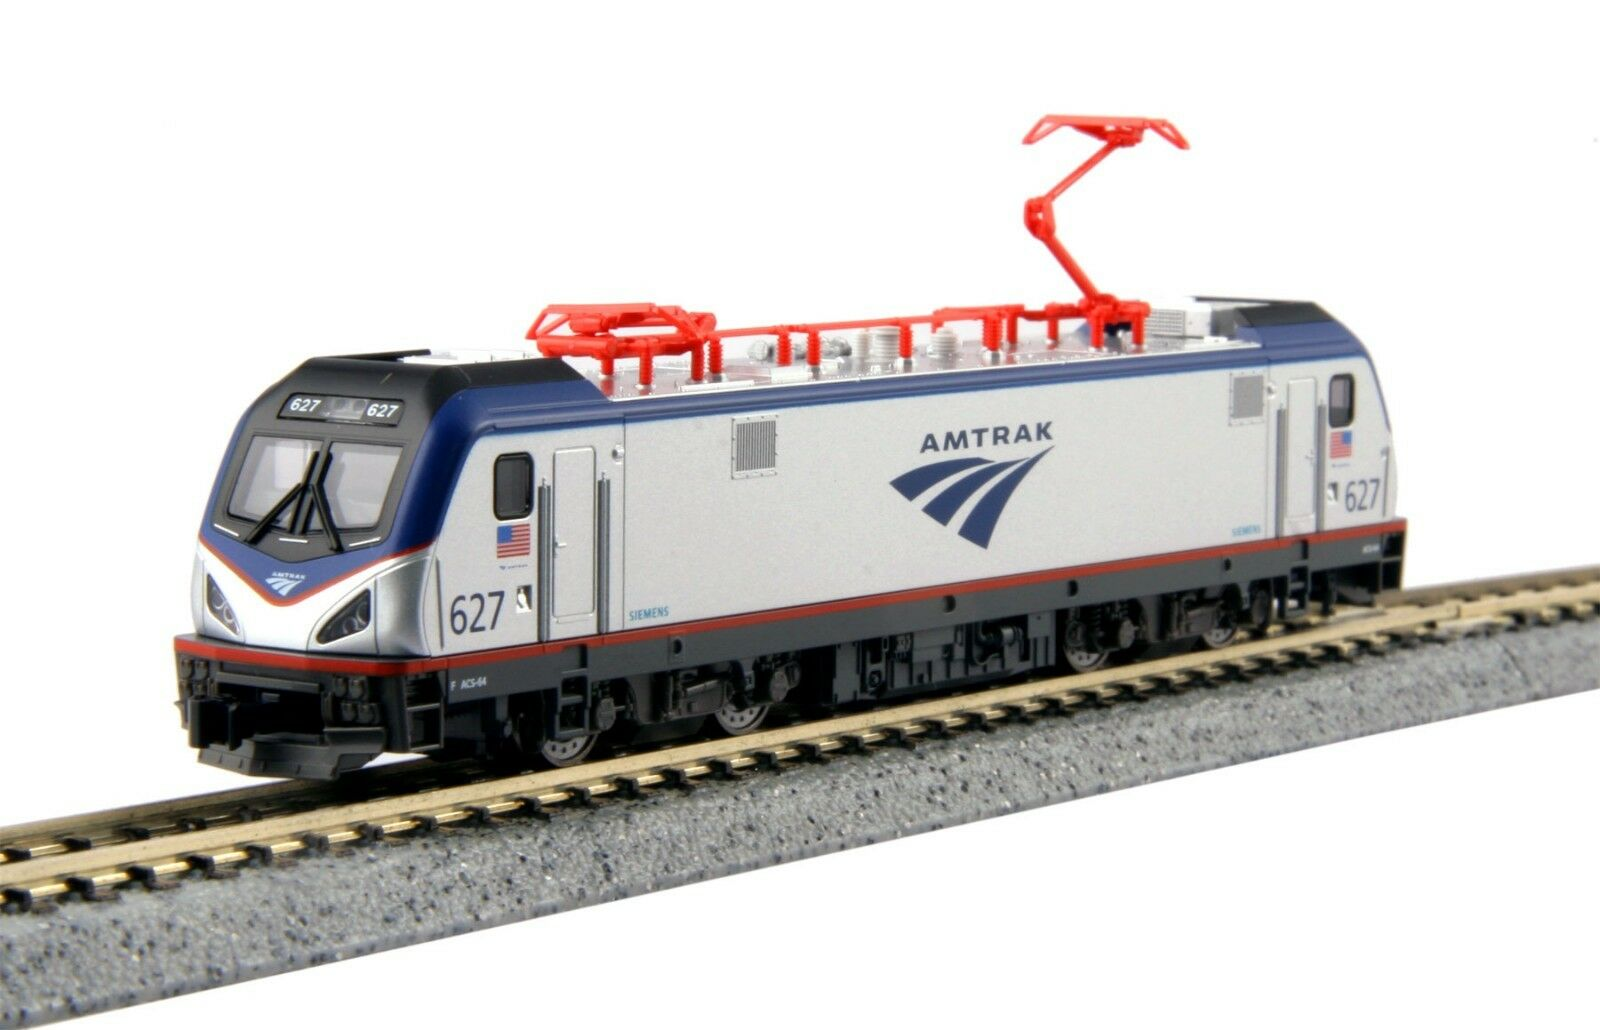 Escala N-Kato 137-3002 Amtrak Locomotora ACS-64   627 Dcc Listo